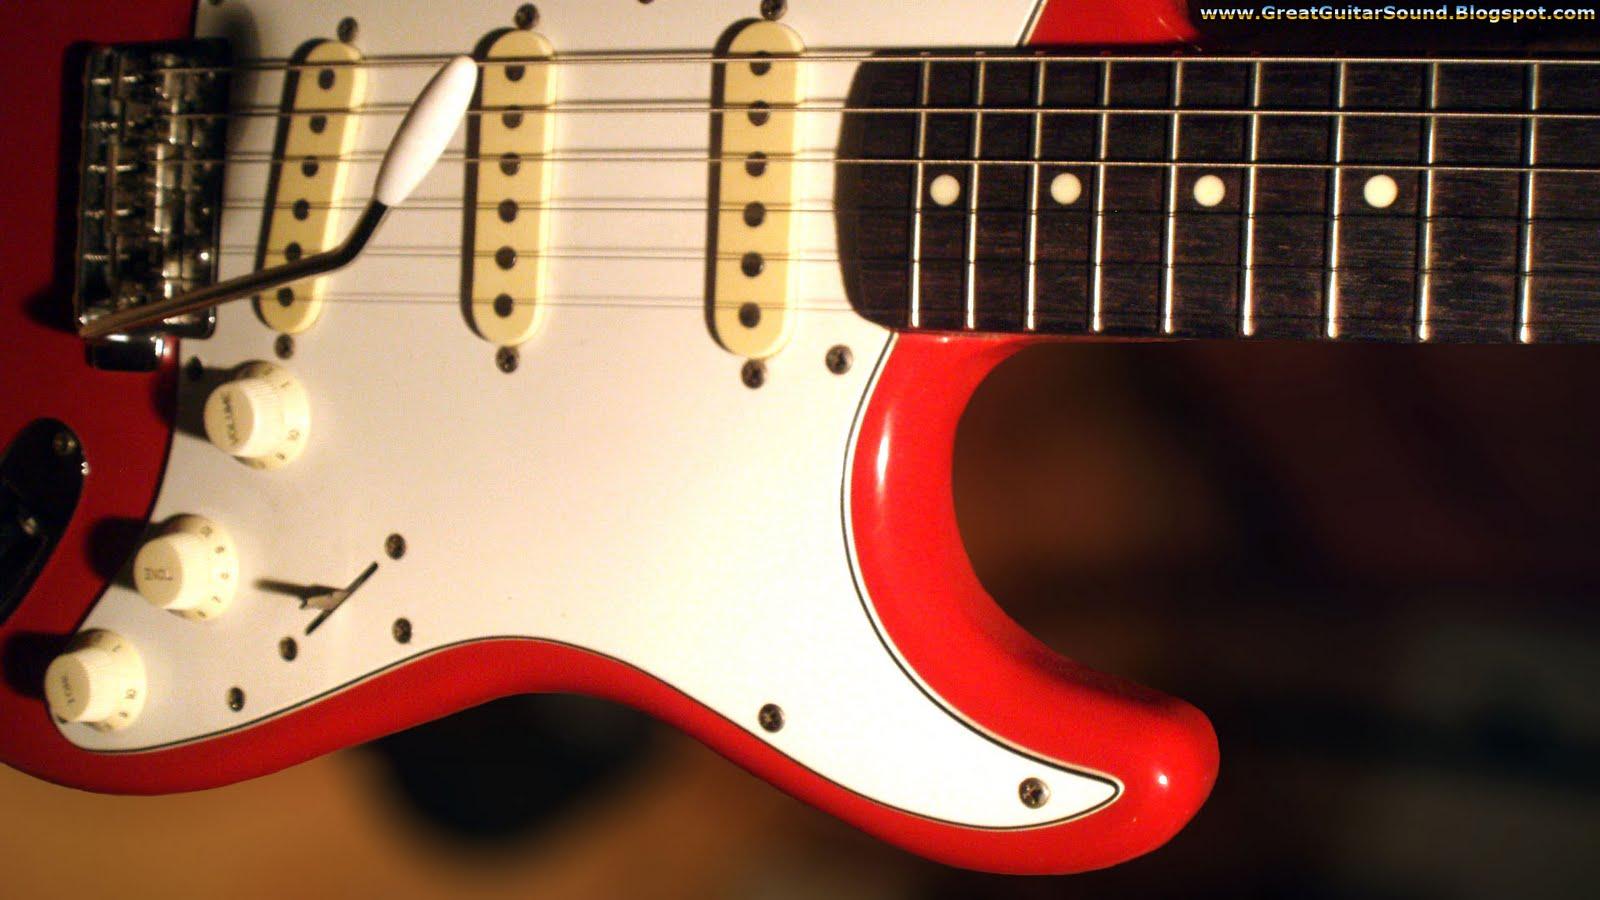 Guitar Wallpaper 3D Effect Fender Stratocaster Electric guitar 1600x900